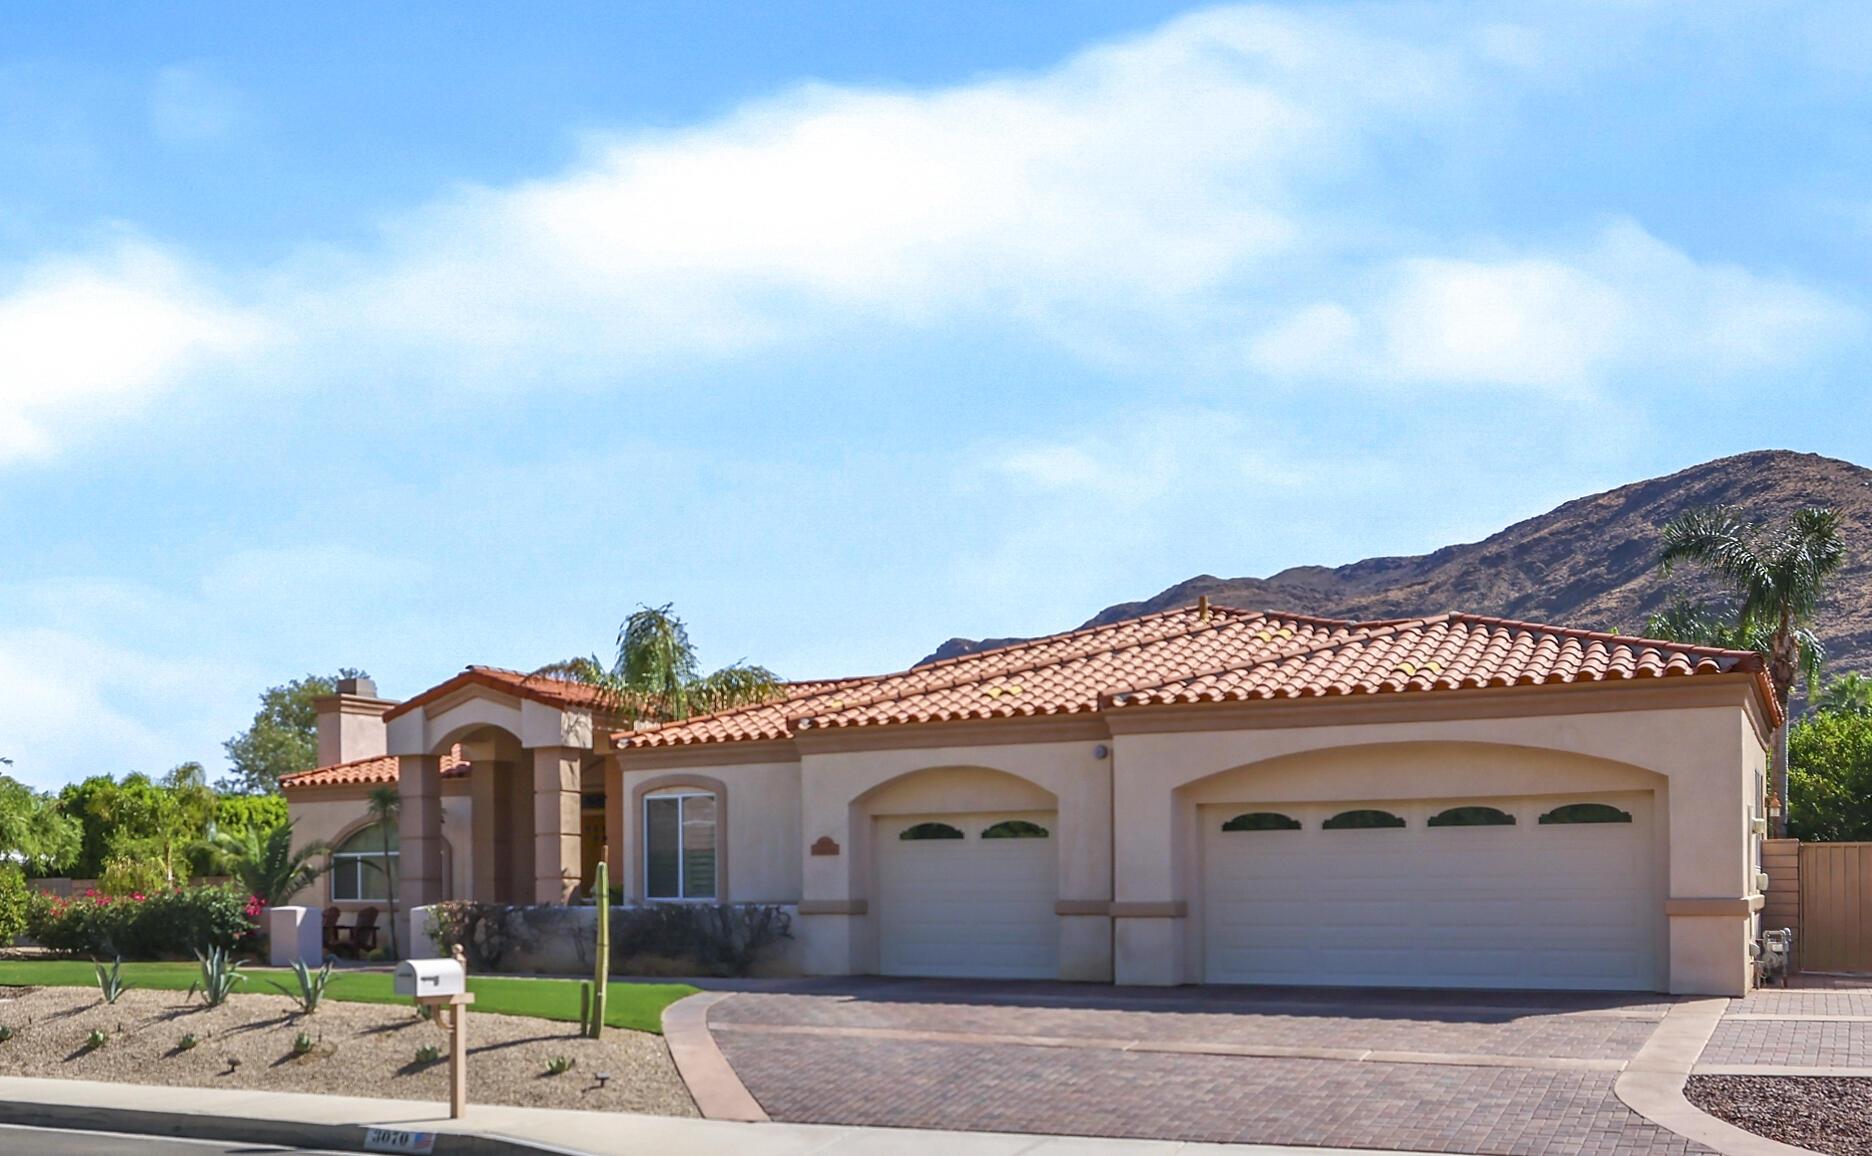 Photo of 3070 Goldenrod Lane, Palm Springs, CA 92264